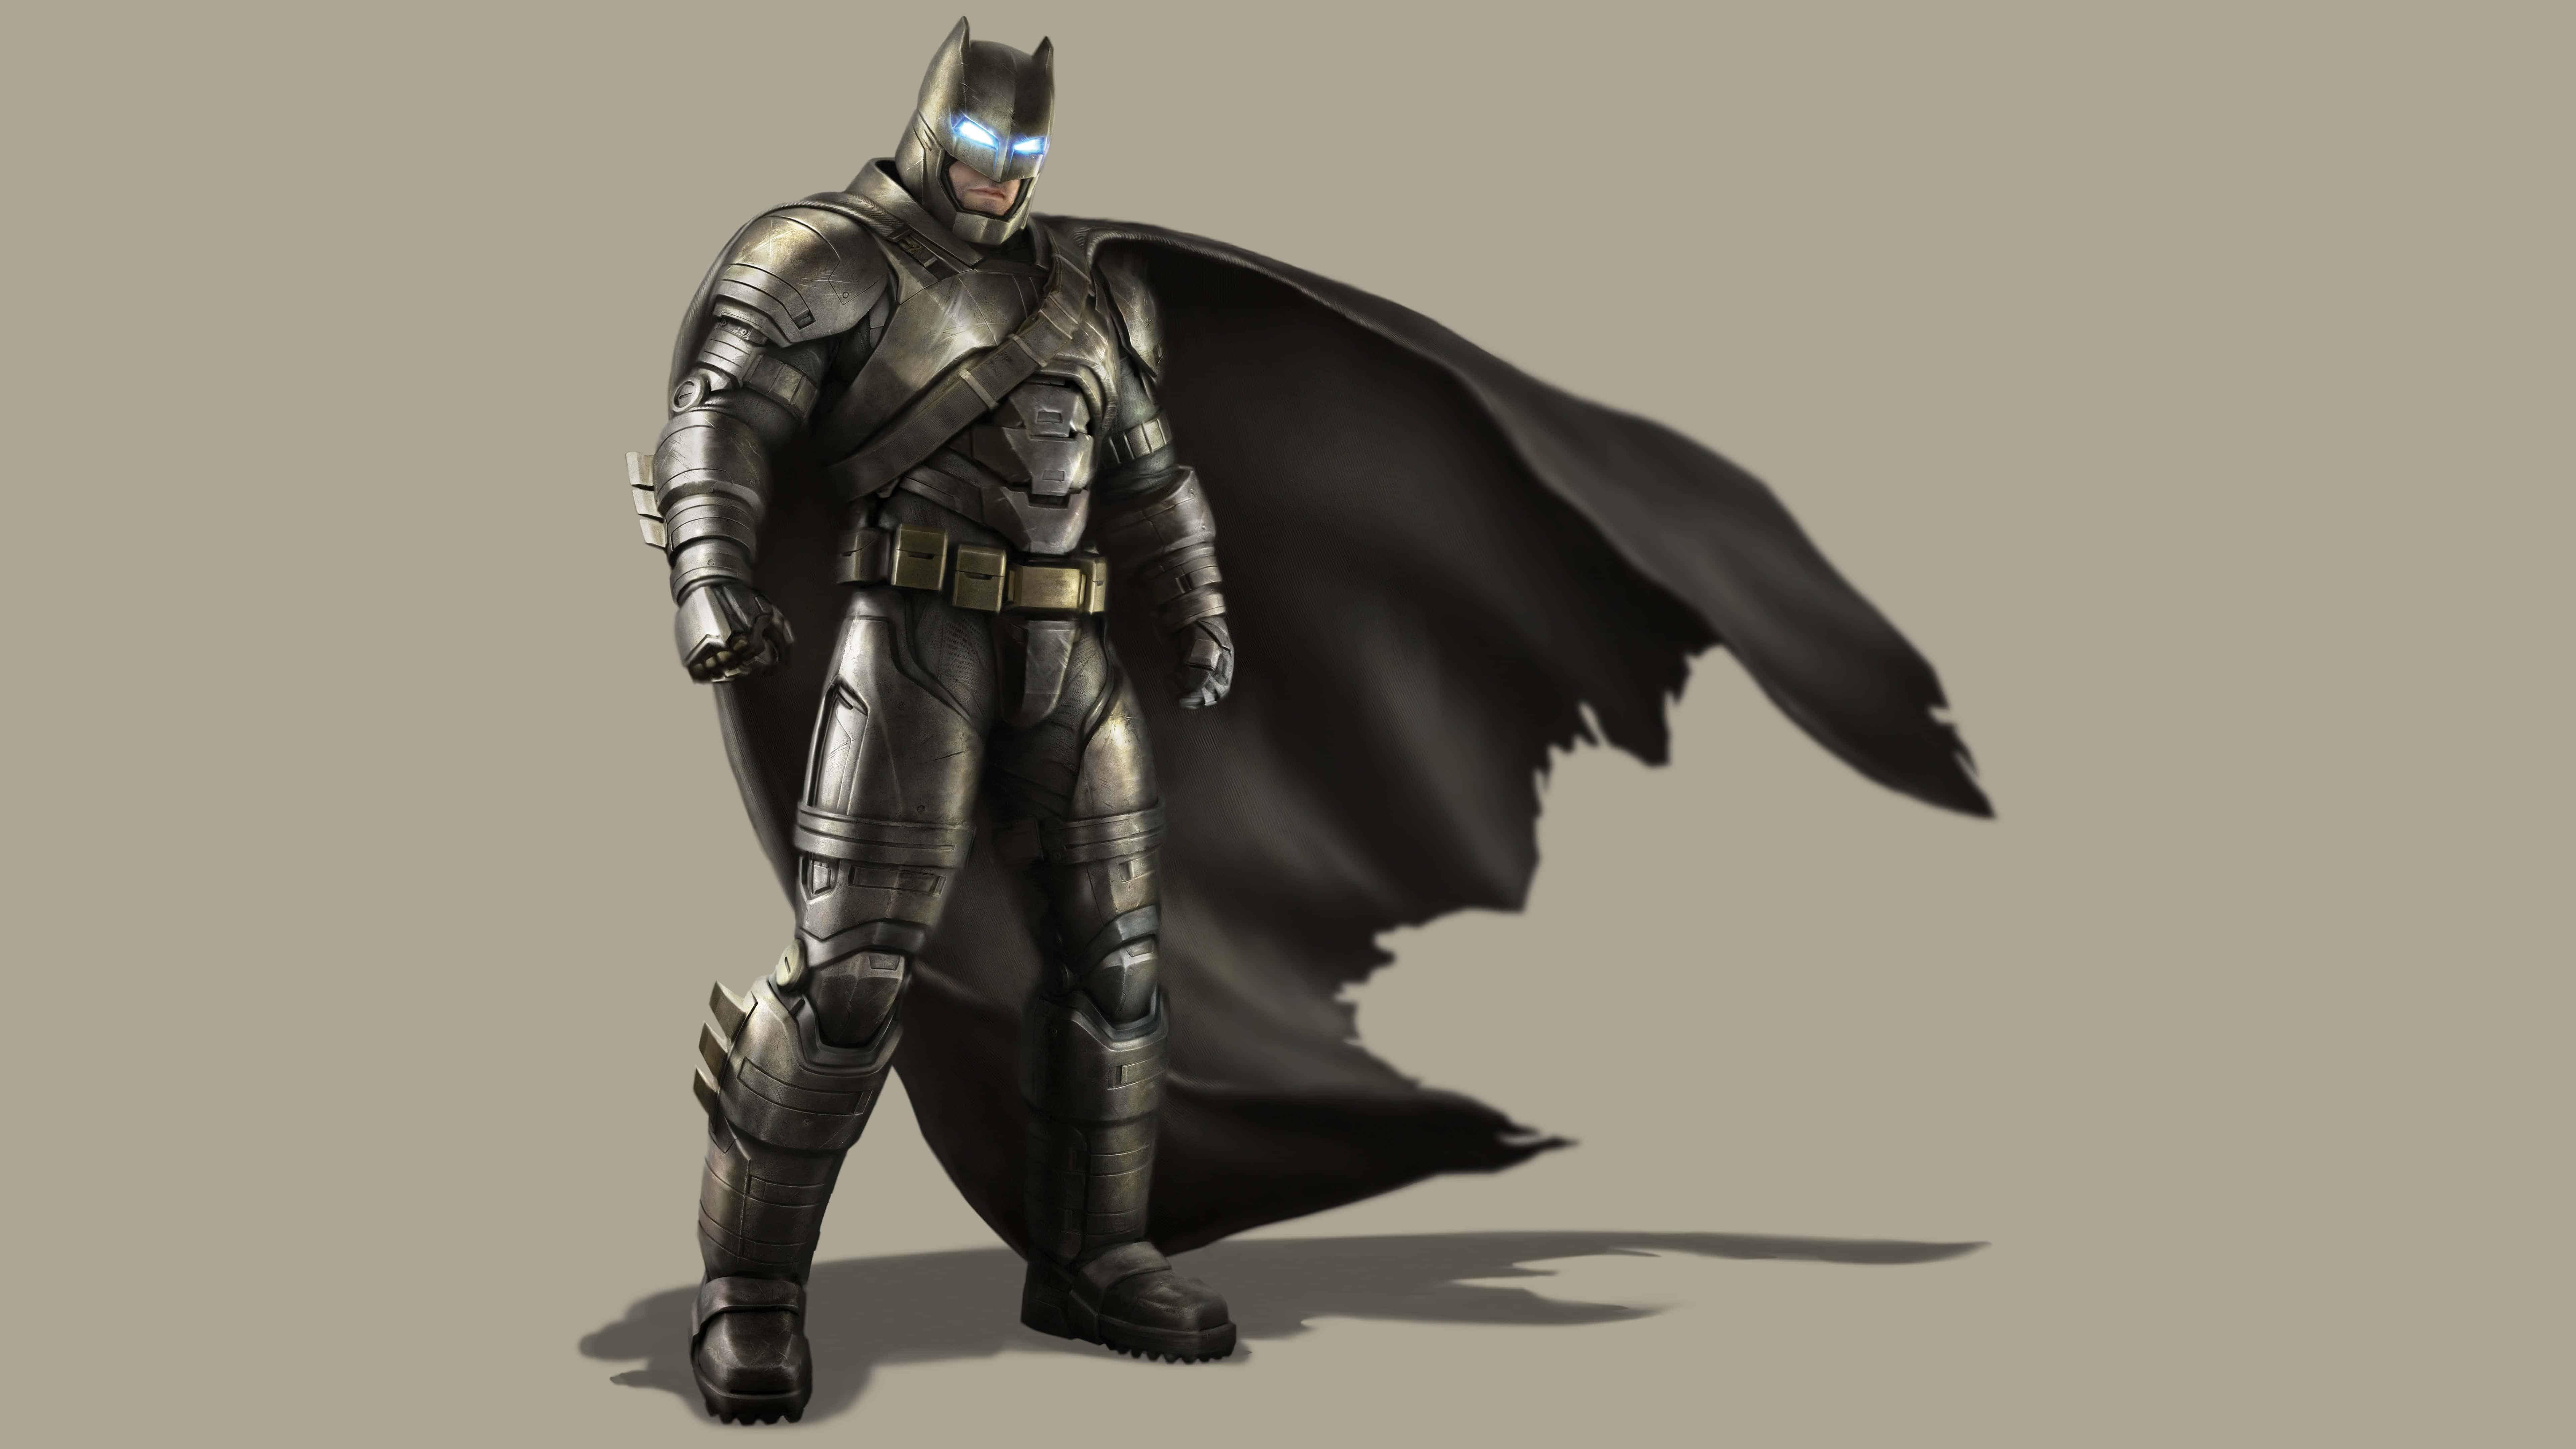 Batman Metal Mech Batsuit Uhd 8k Wallpaper